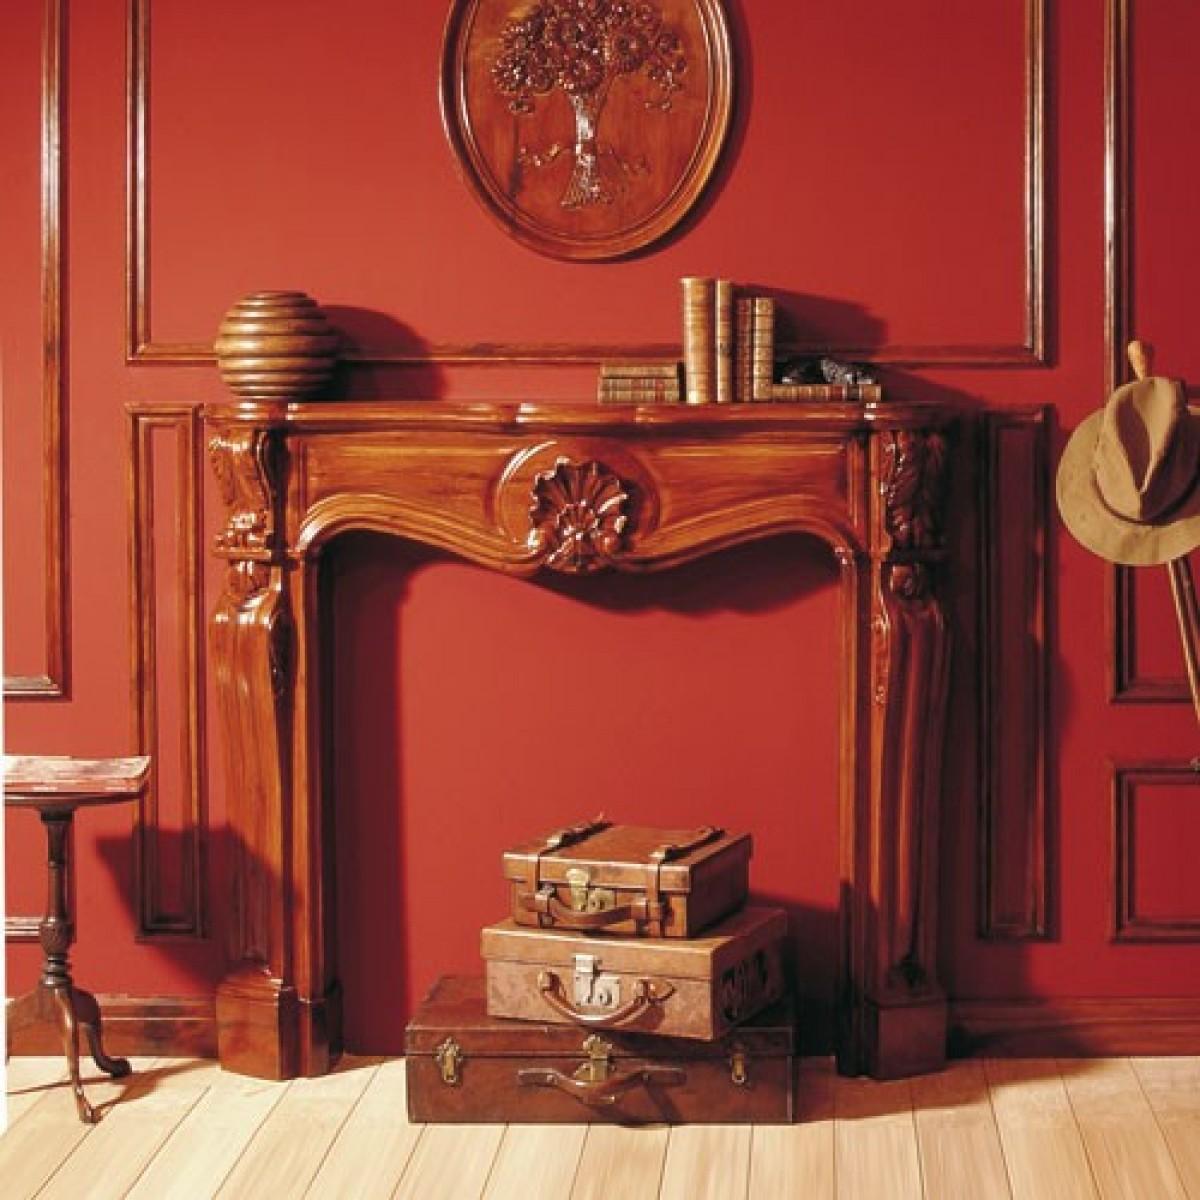 Semineu Decorativ Luxxus H100B, Dimensiuni: 19 X 87.3 X 17.5 cm, Orac Decor